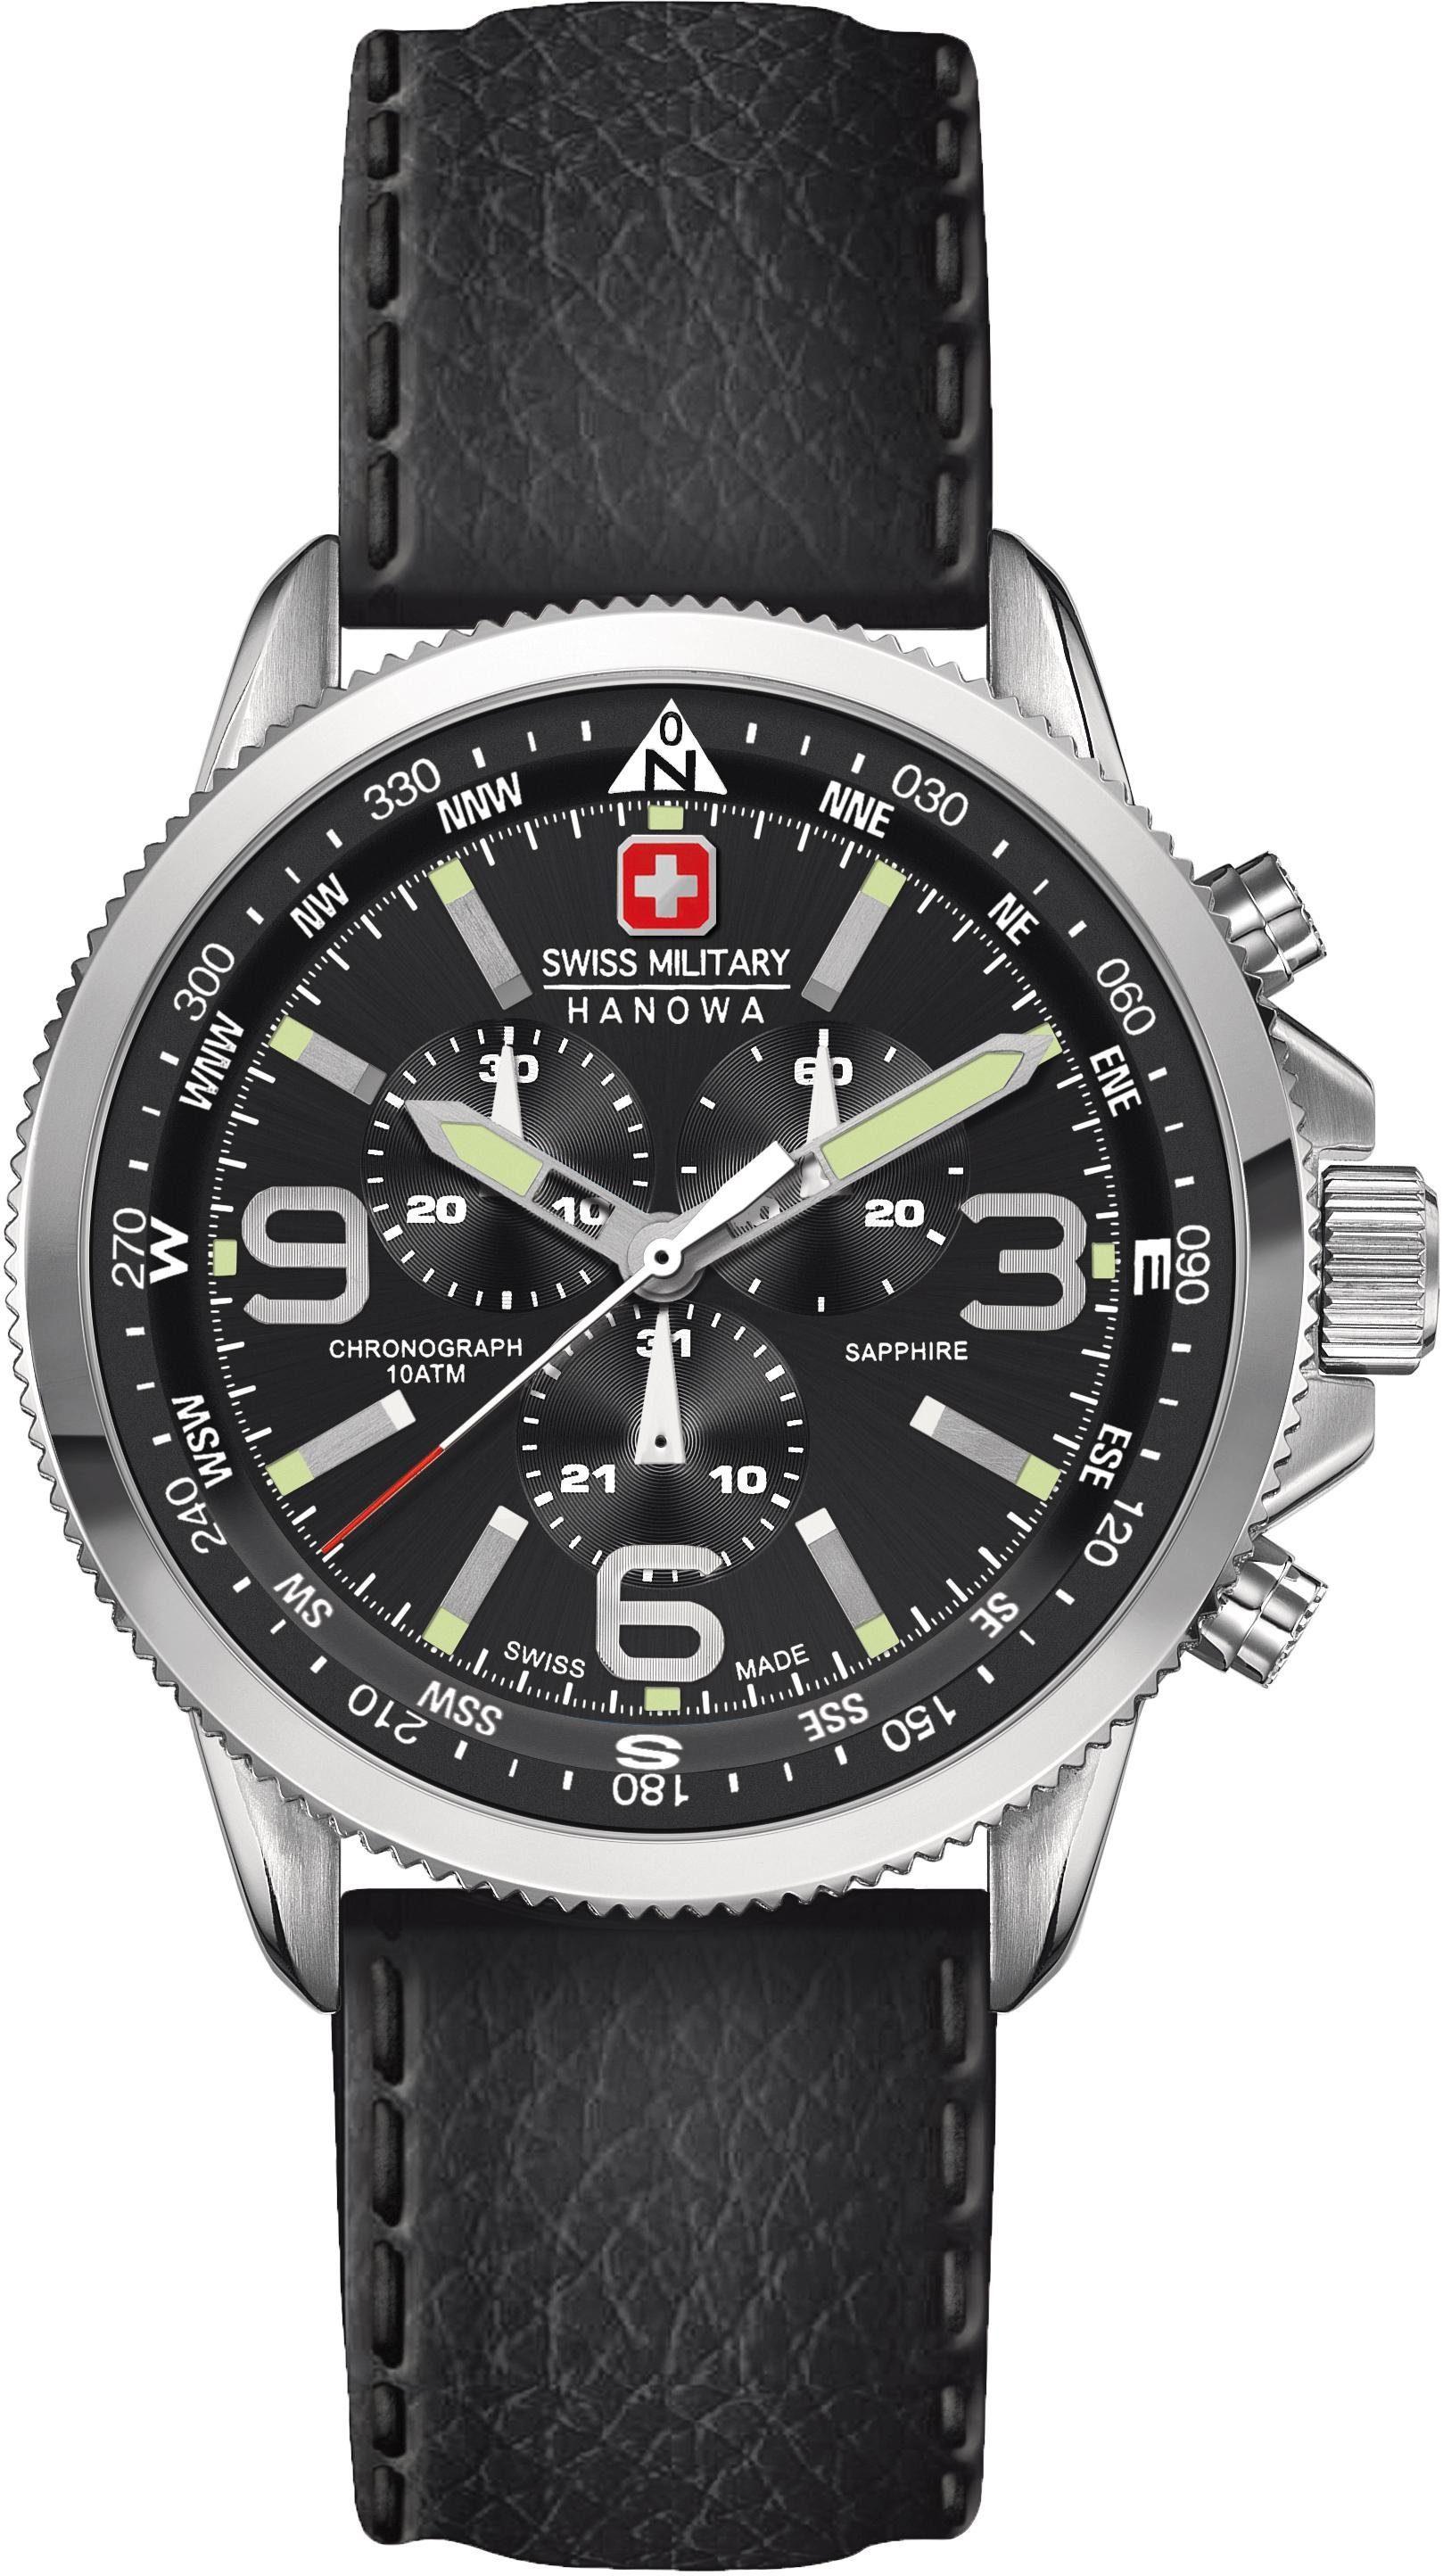 Swiss Military Hanowa Chronograph »ARROW CHRONO, 06-4224.04.007« mit kleiner Sekunde